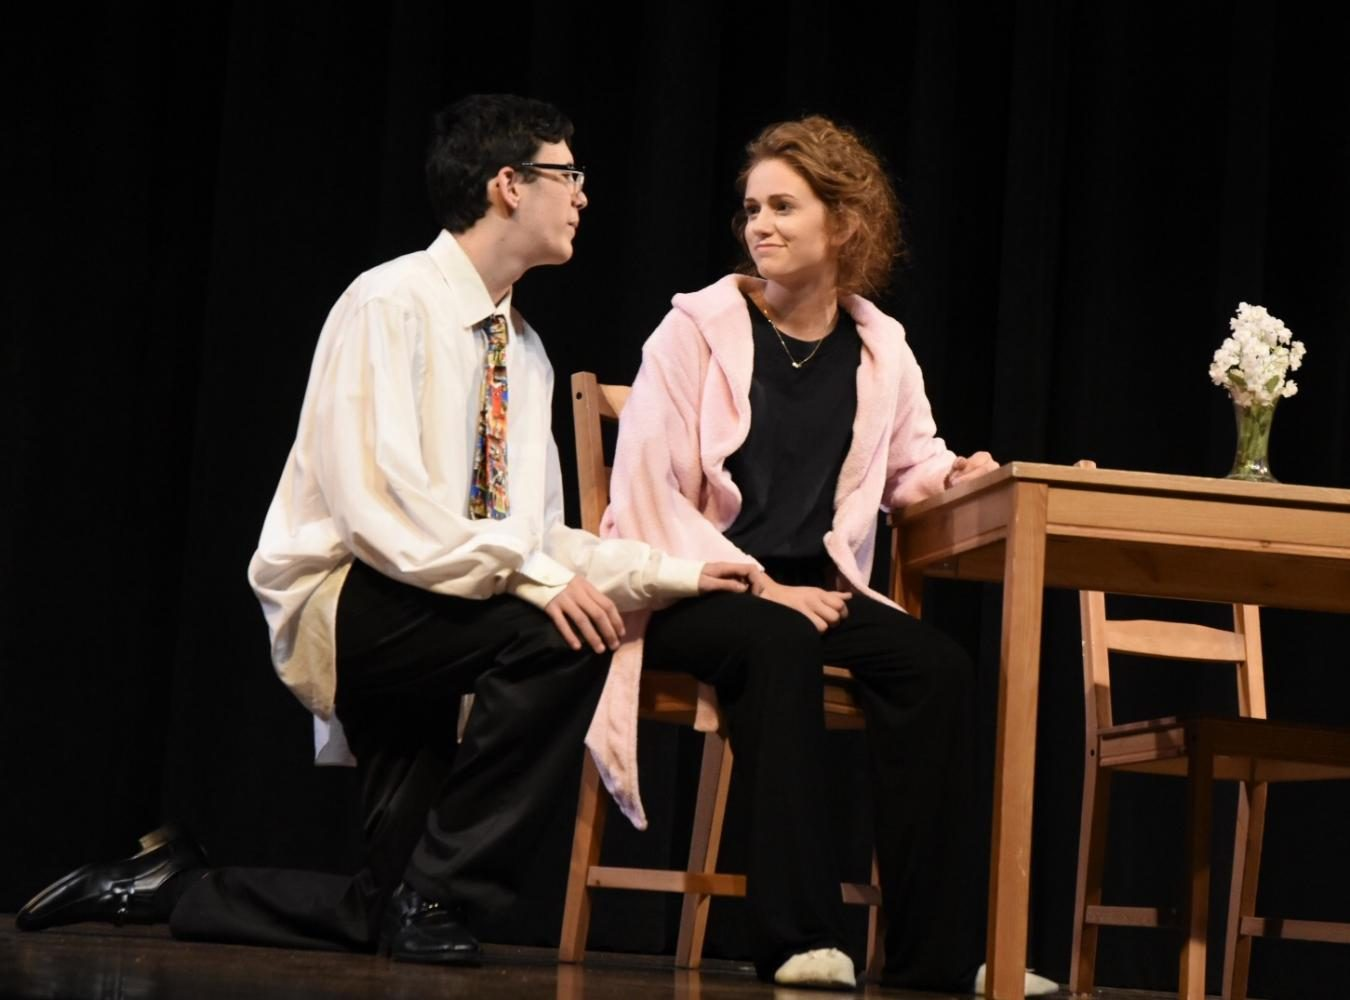 Freshman Ryan Castiglia and sophomore Megan Kordik on stage during the 24 Play Festival